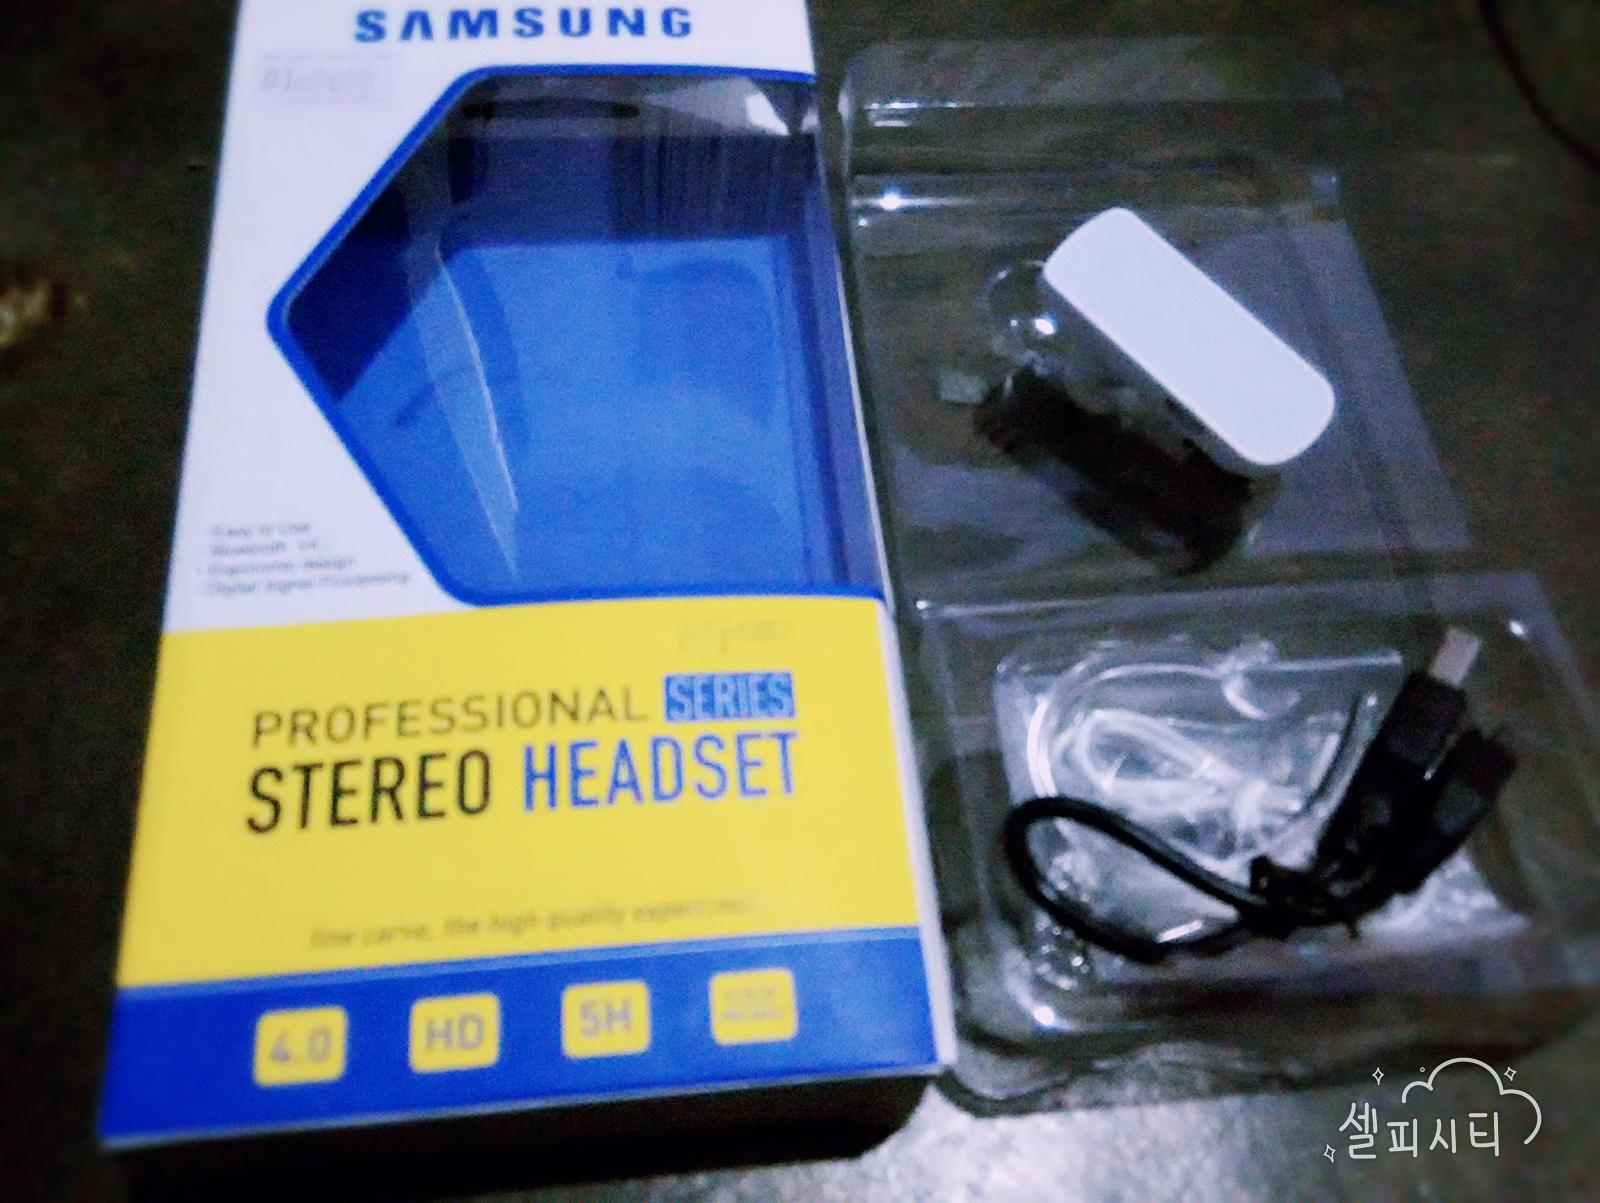 Jomblo Lagi Nulis Cara Penggunaan Headset Stereo Bluetooth Samsung